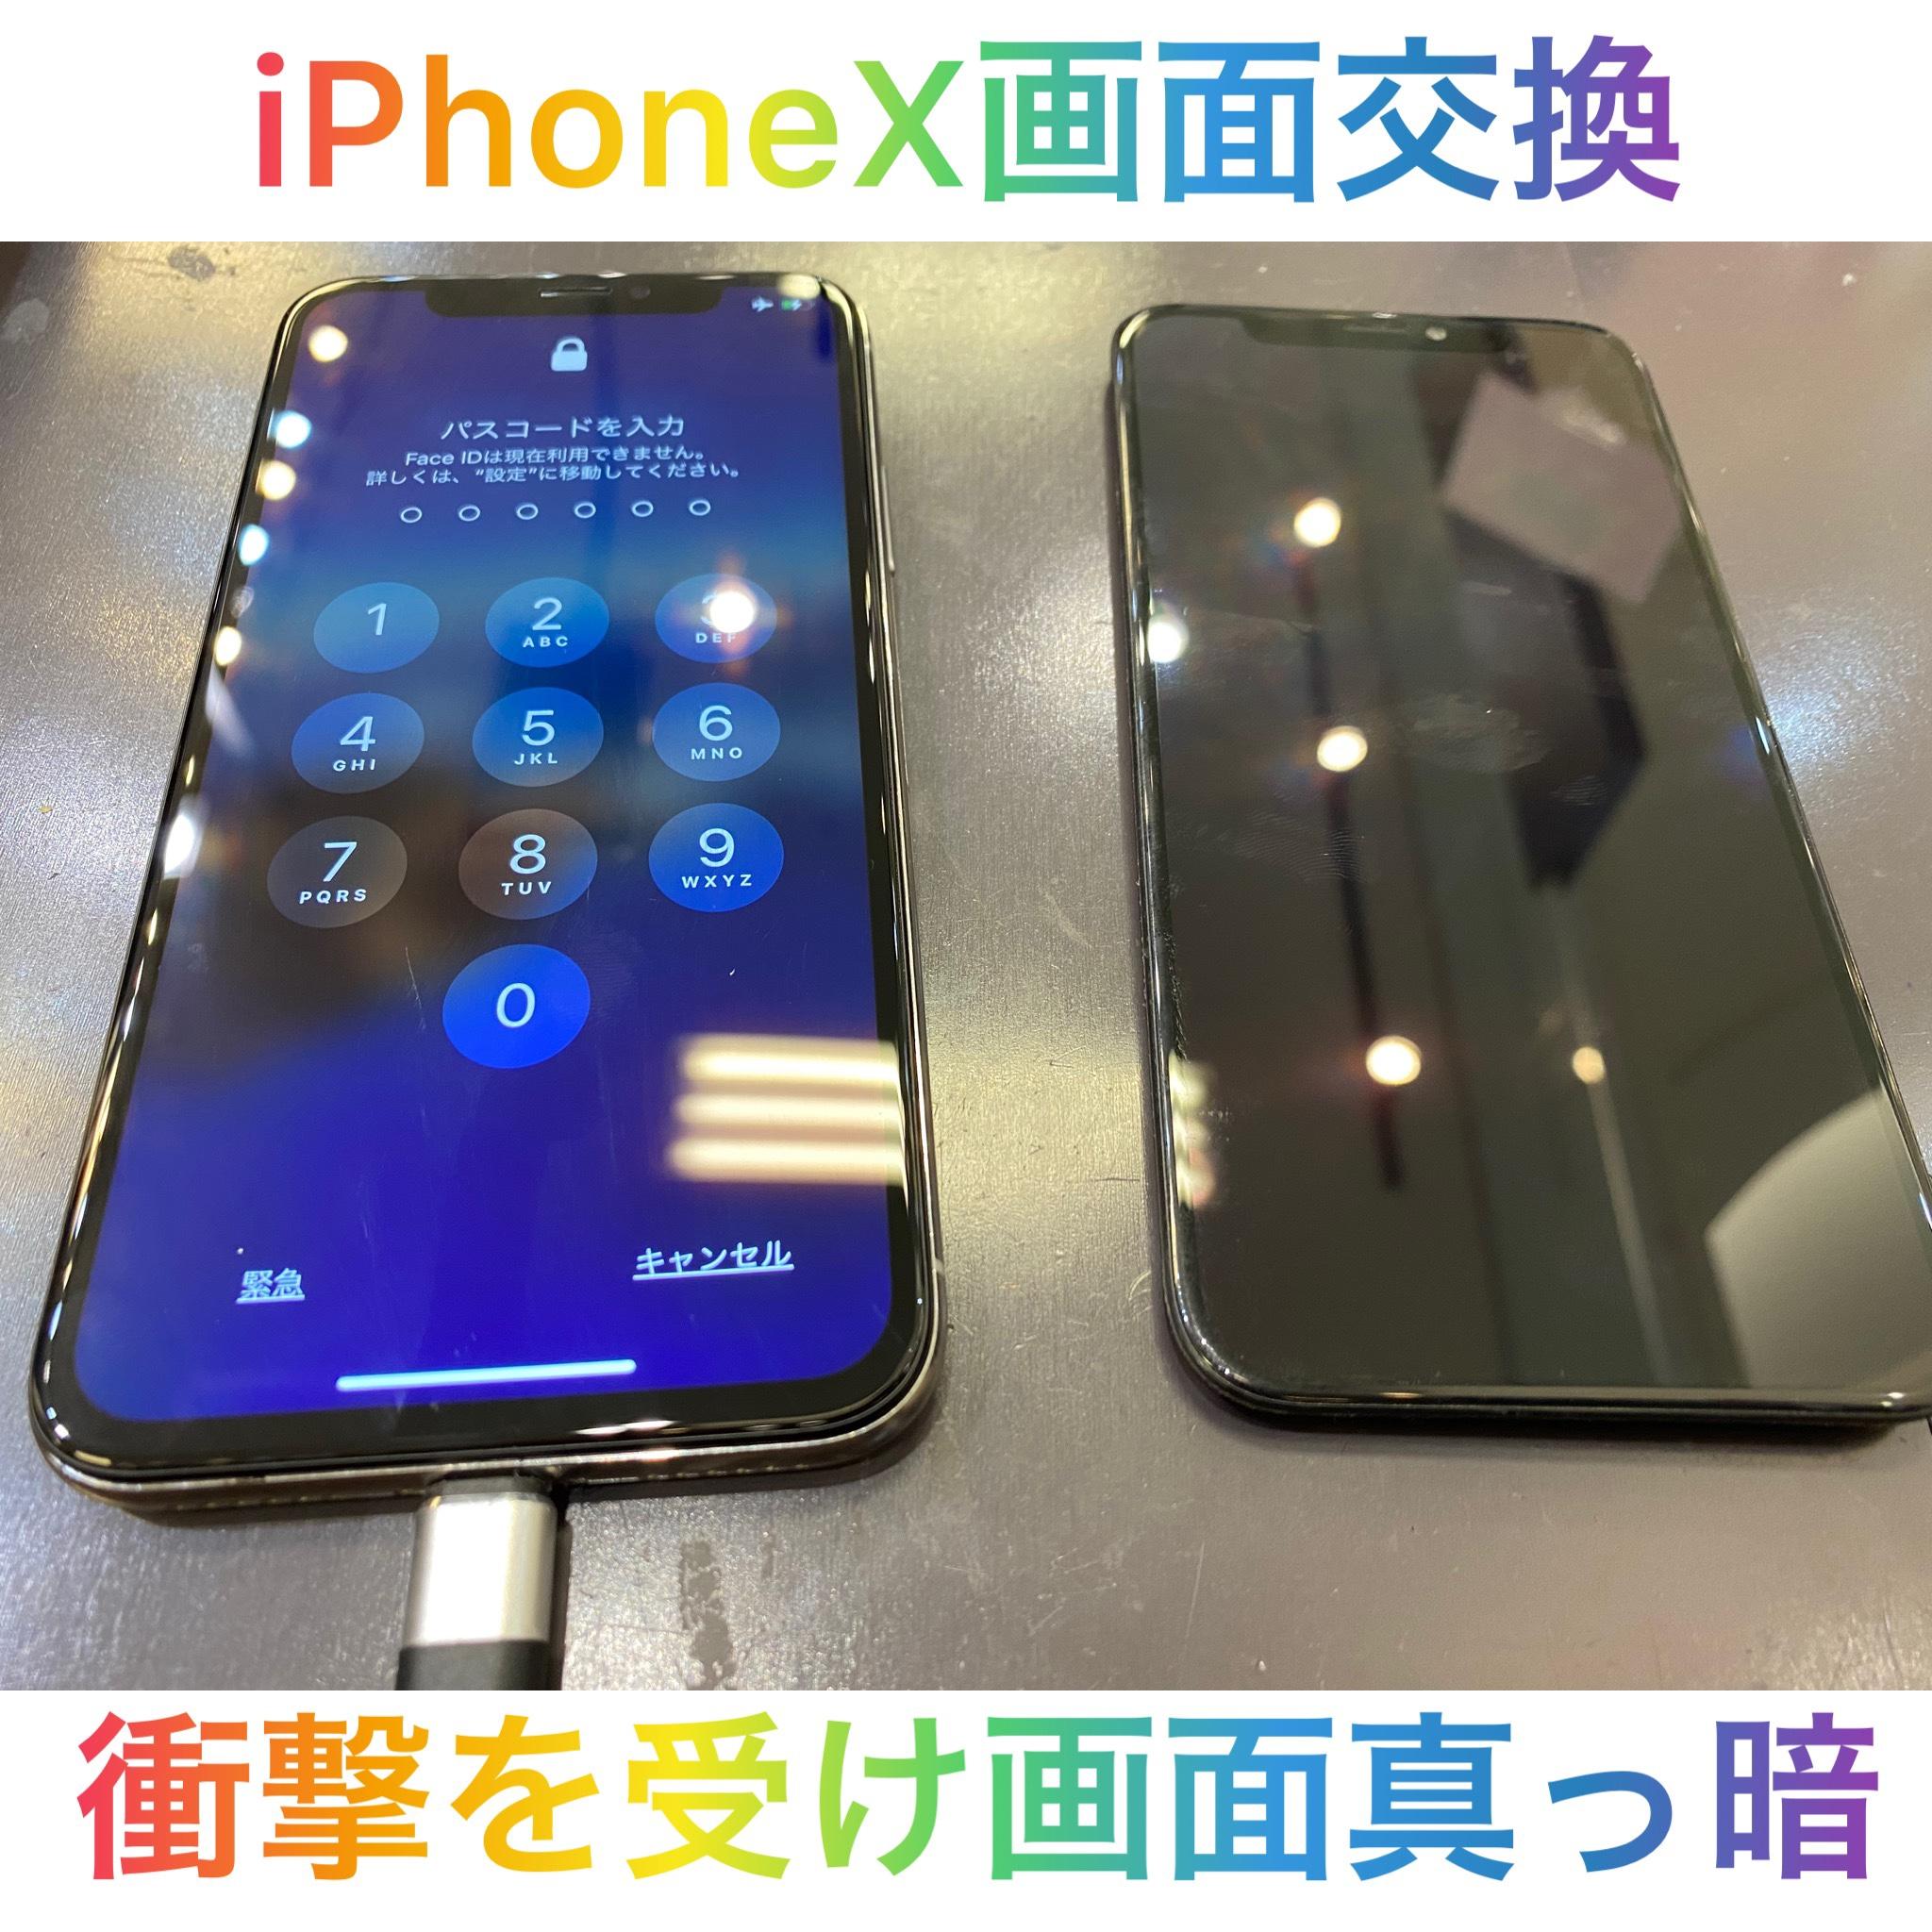 ★iPhoneX・衝撃を受けてから画面真っ暗→画面交換30分~・東区よりお越しのお客様